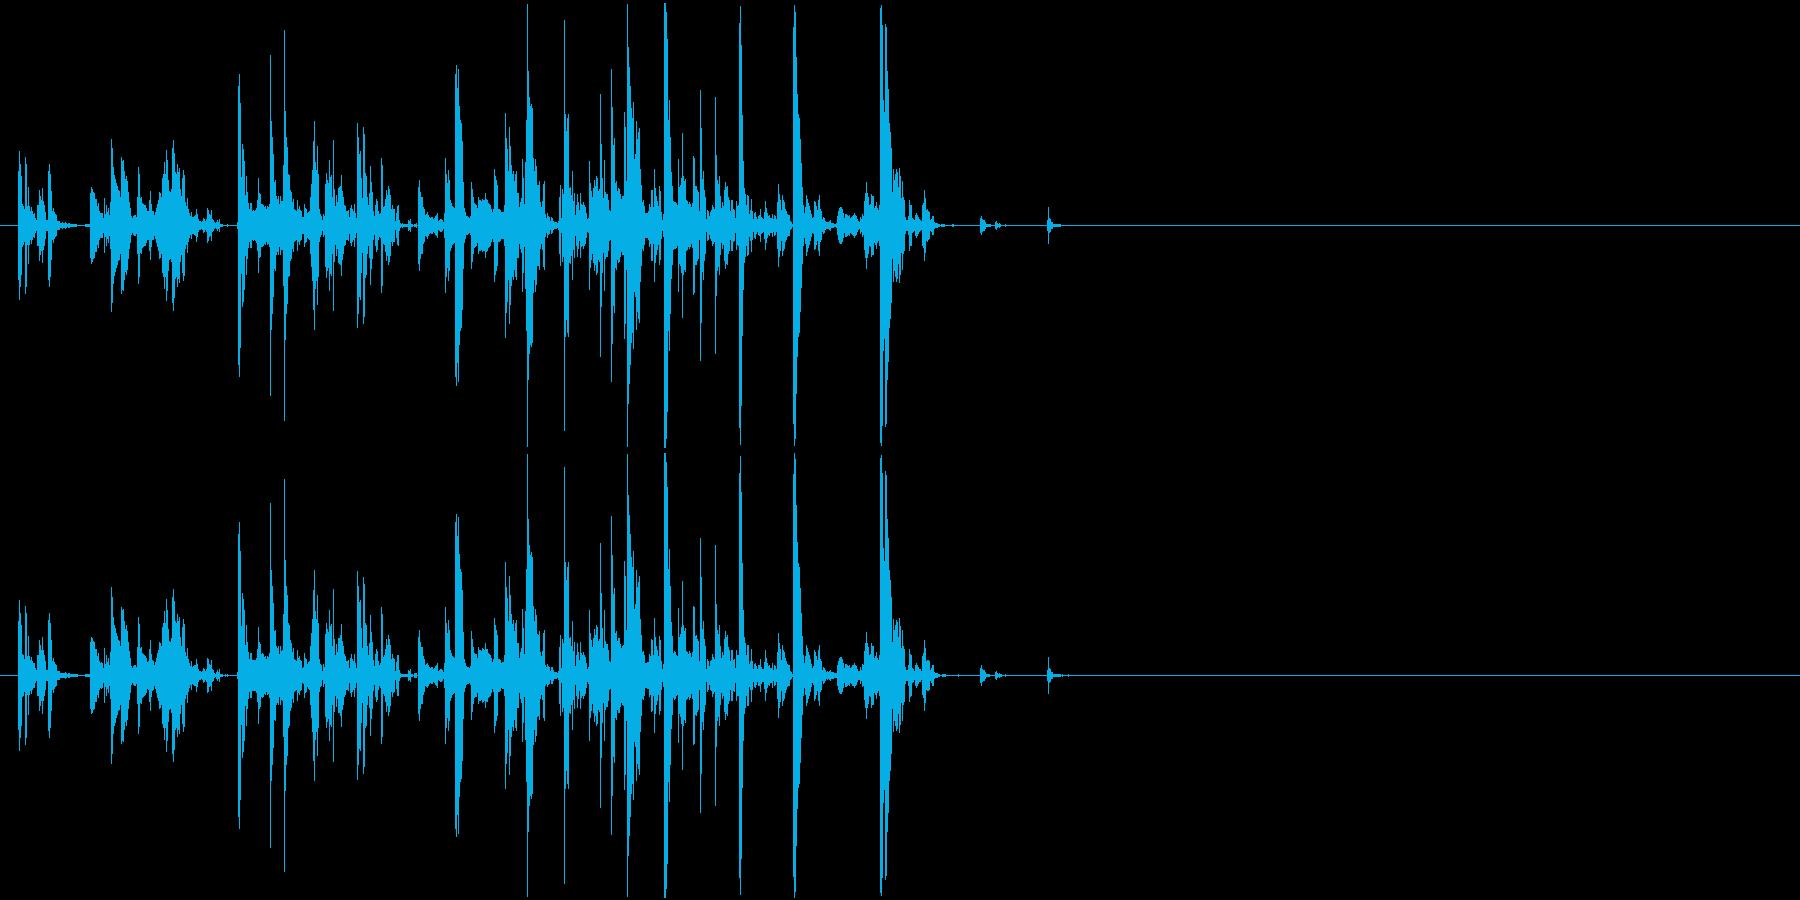 Suzu 鈴の音色 猫の首輪 ペットの再生済みの波形